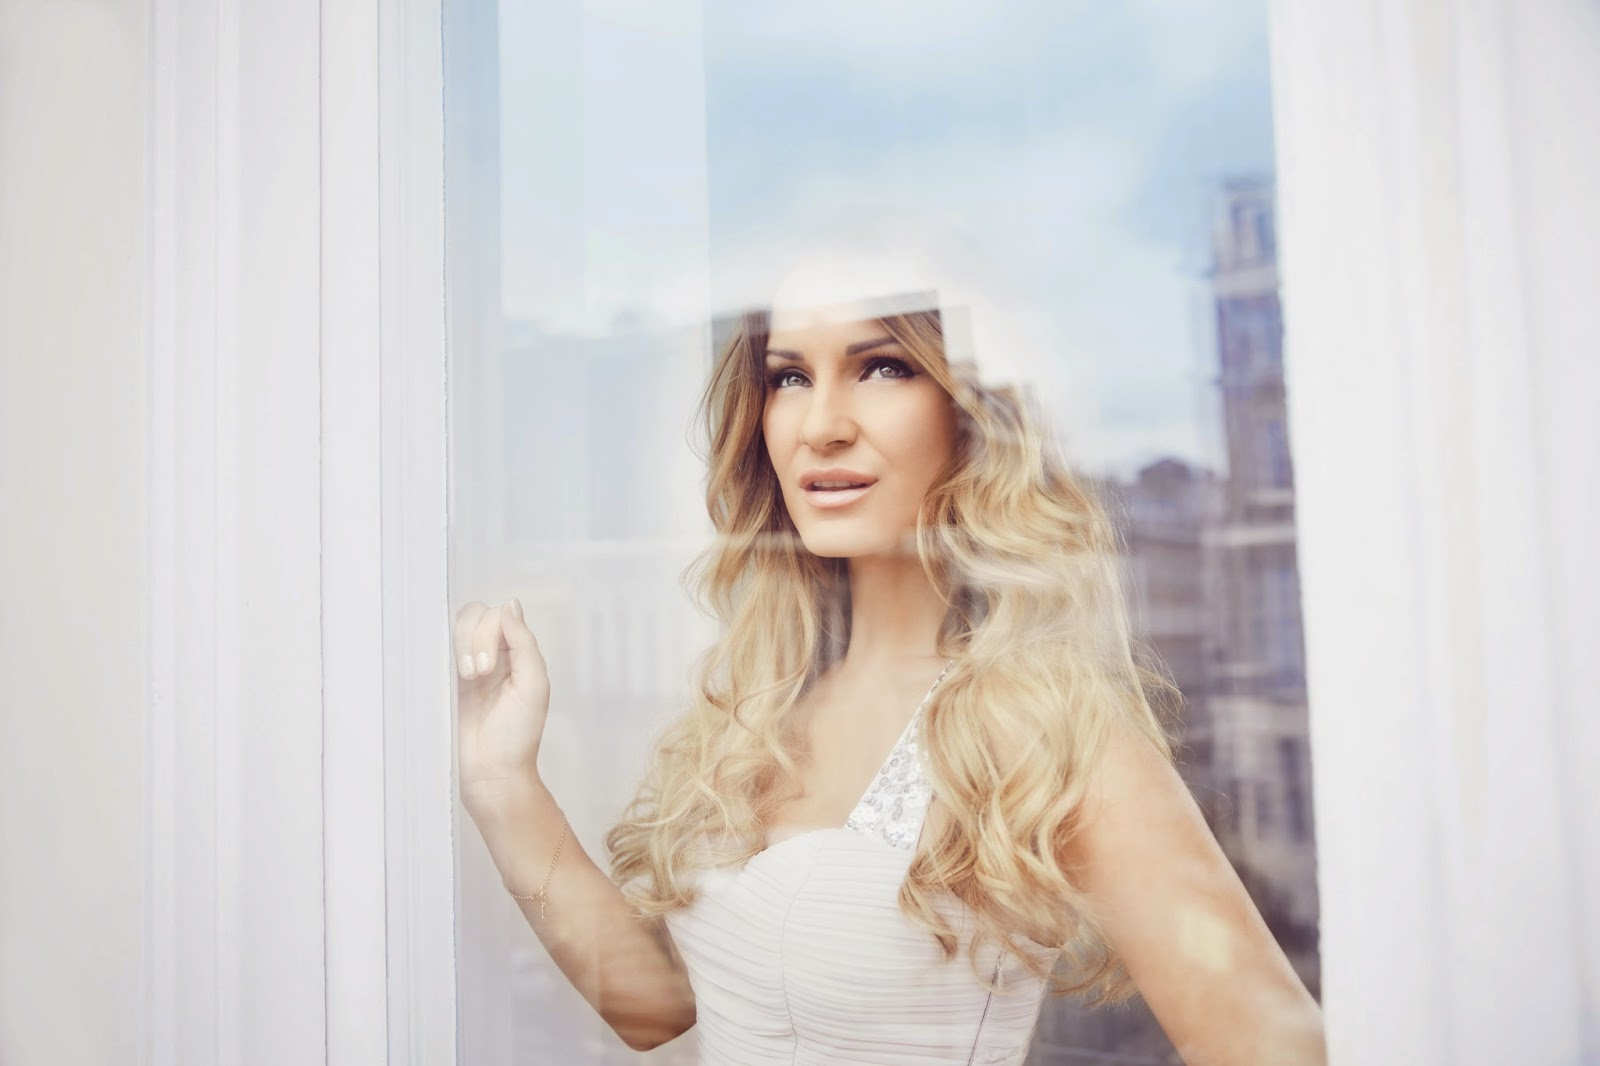 Samantha Sam Faiers TOWIE Debut fragrance La Bella